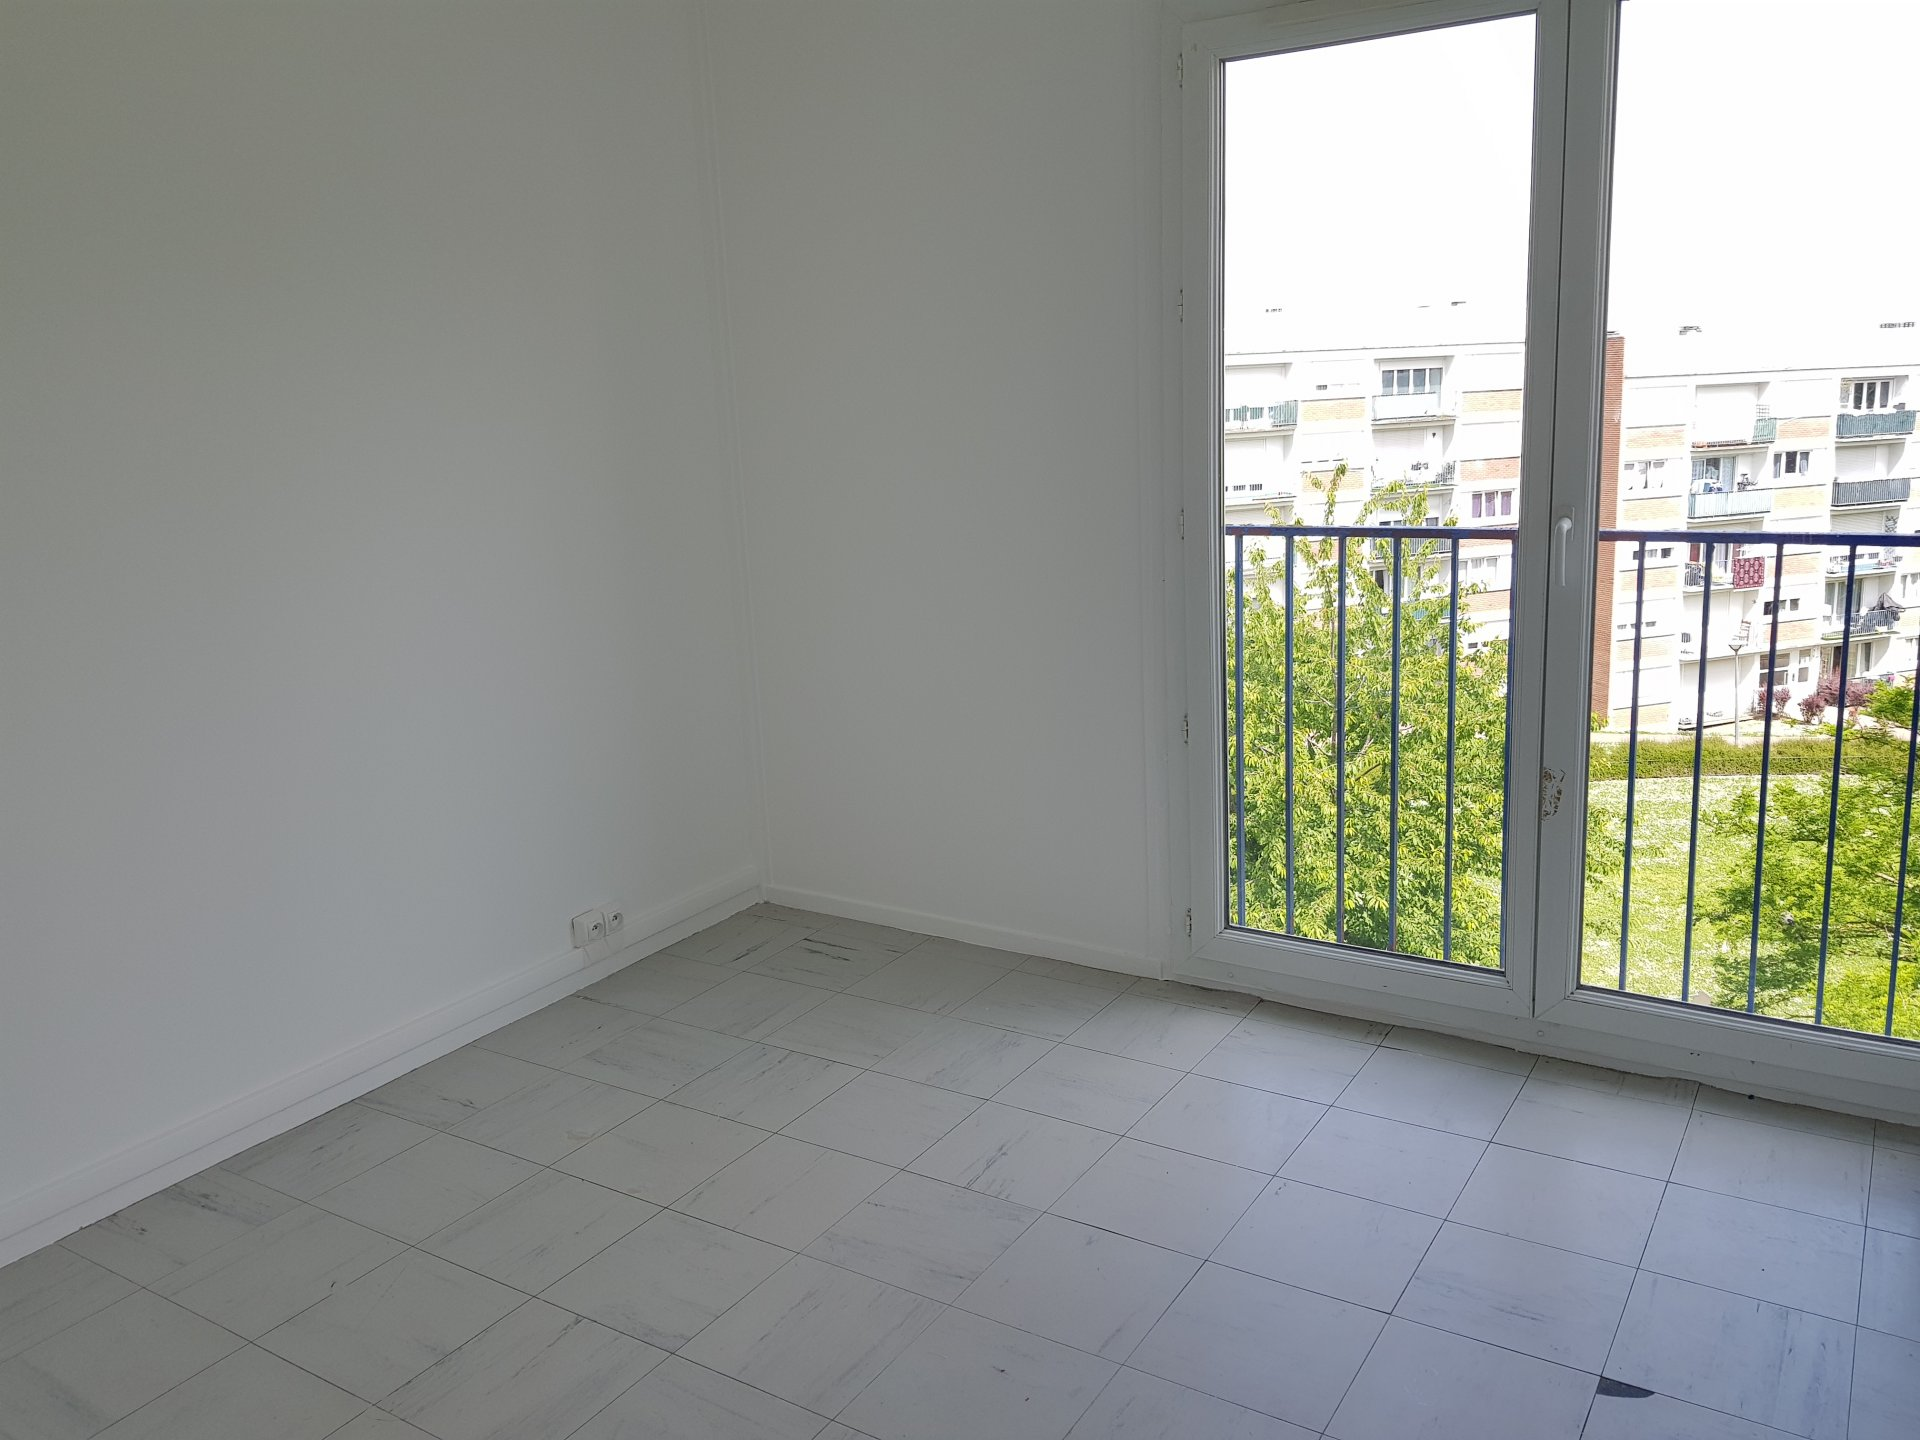 Appartement 4 pièces Meulan-en-Yvelines